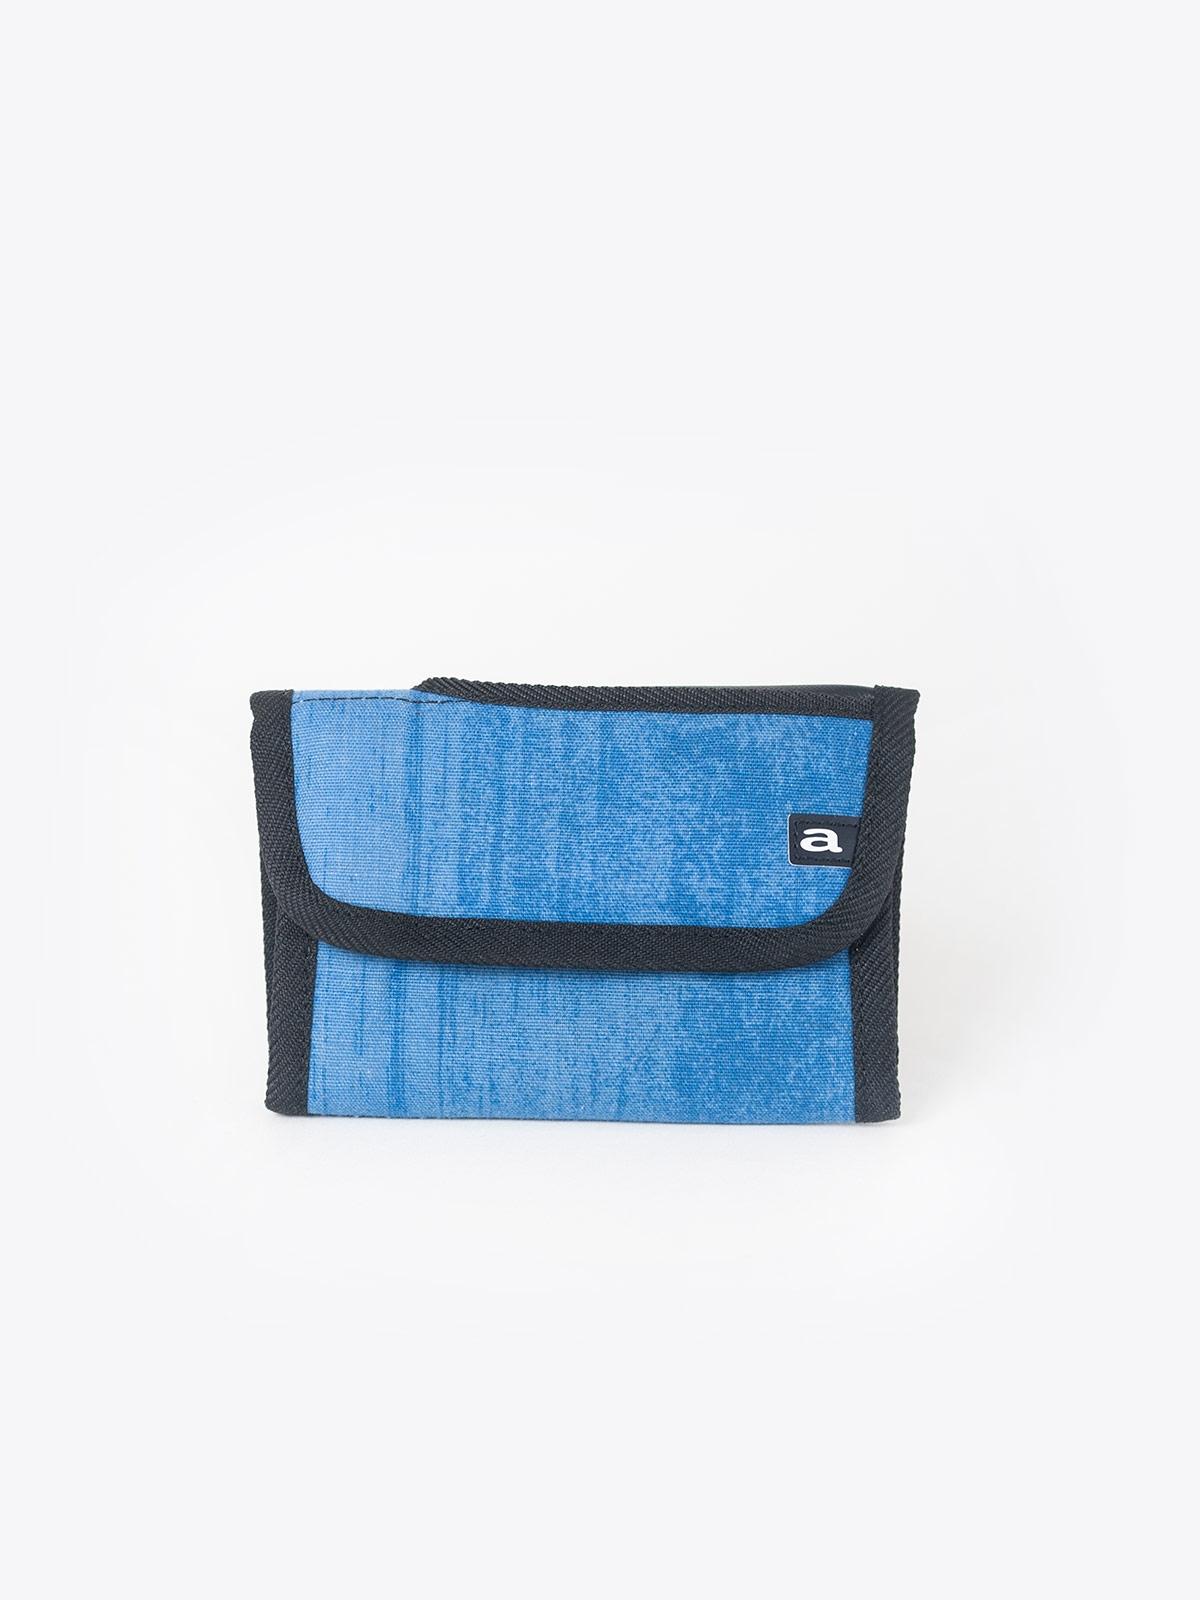 airbag craftworks palermo | 335